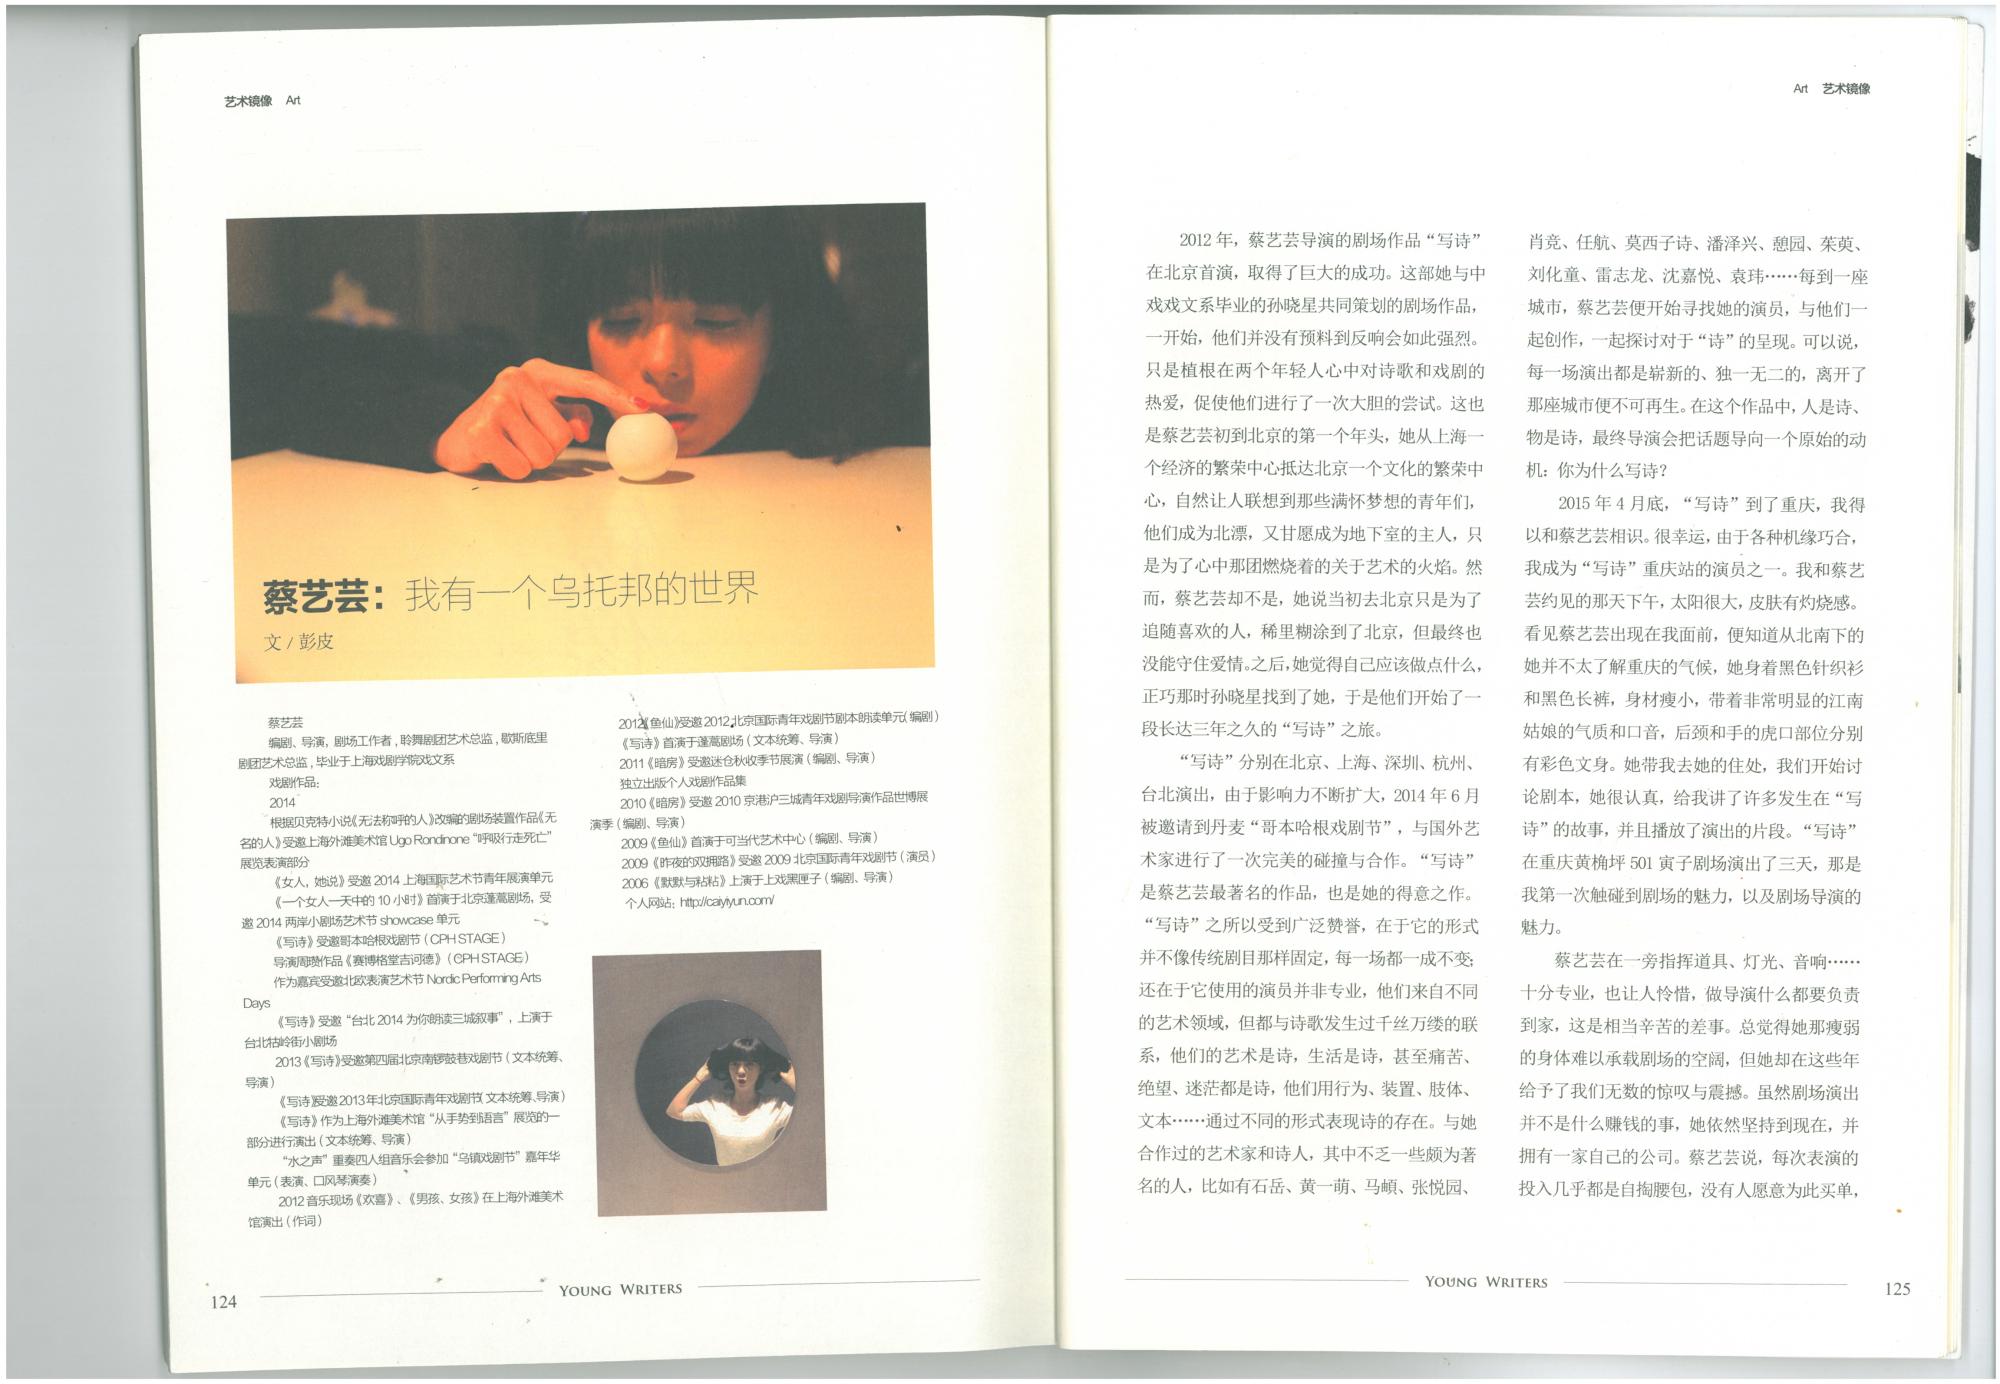 http://www.caiyiyun.com/files/gimgs/33_s45c-315081022571.jpg